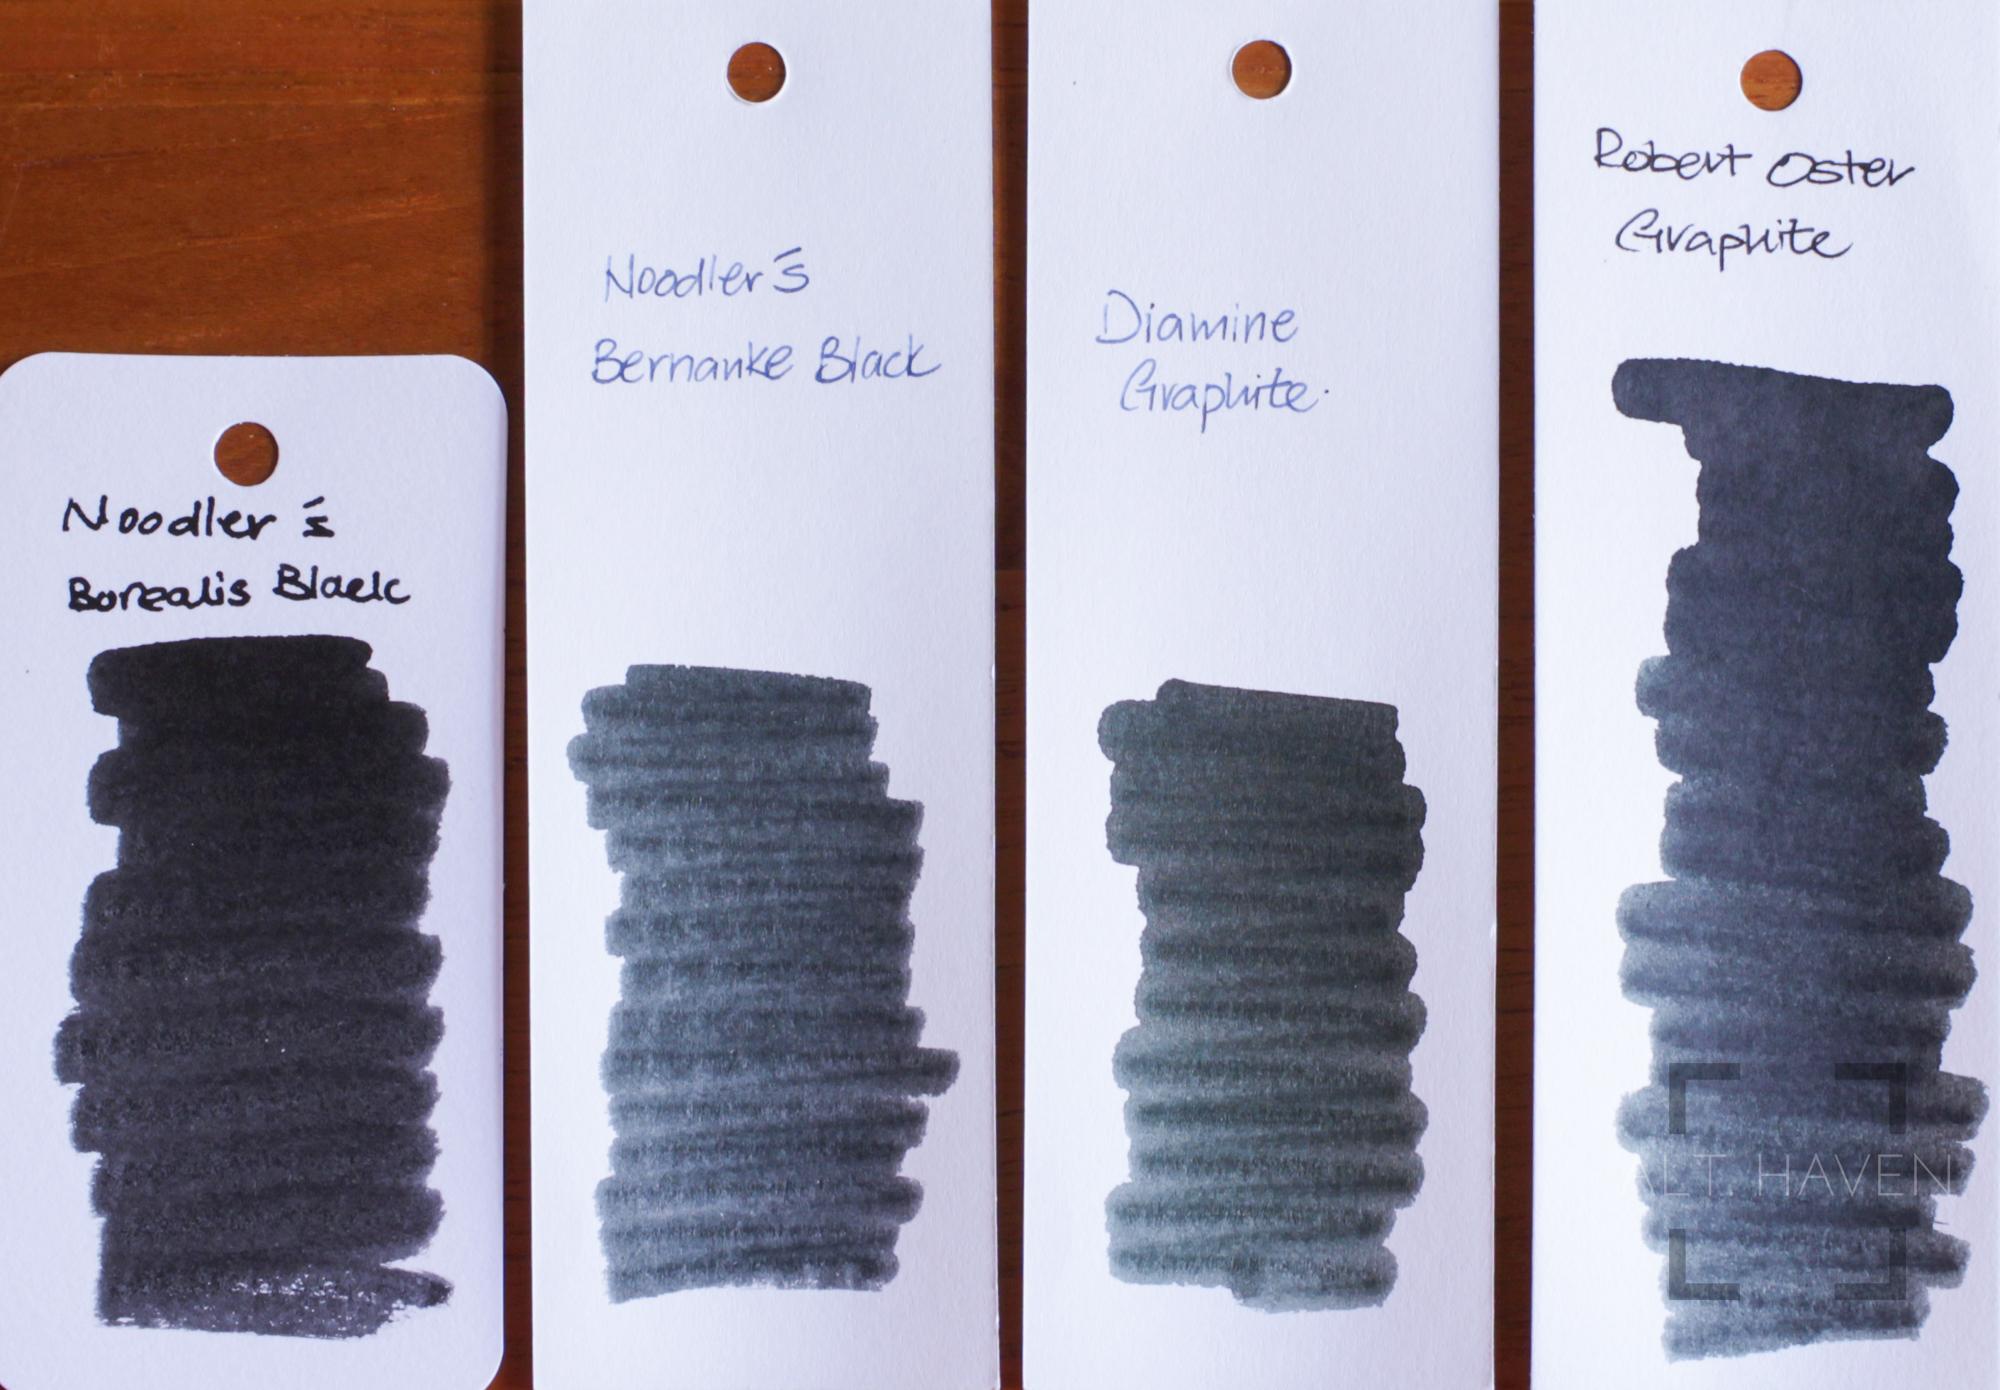 Noodler's Borealis Black-3.jpg